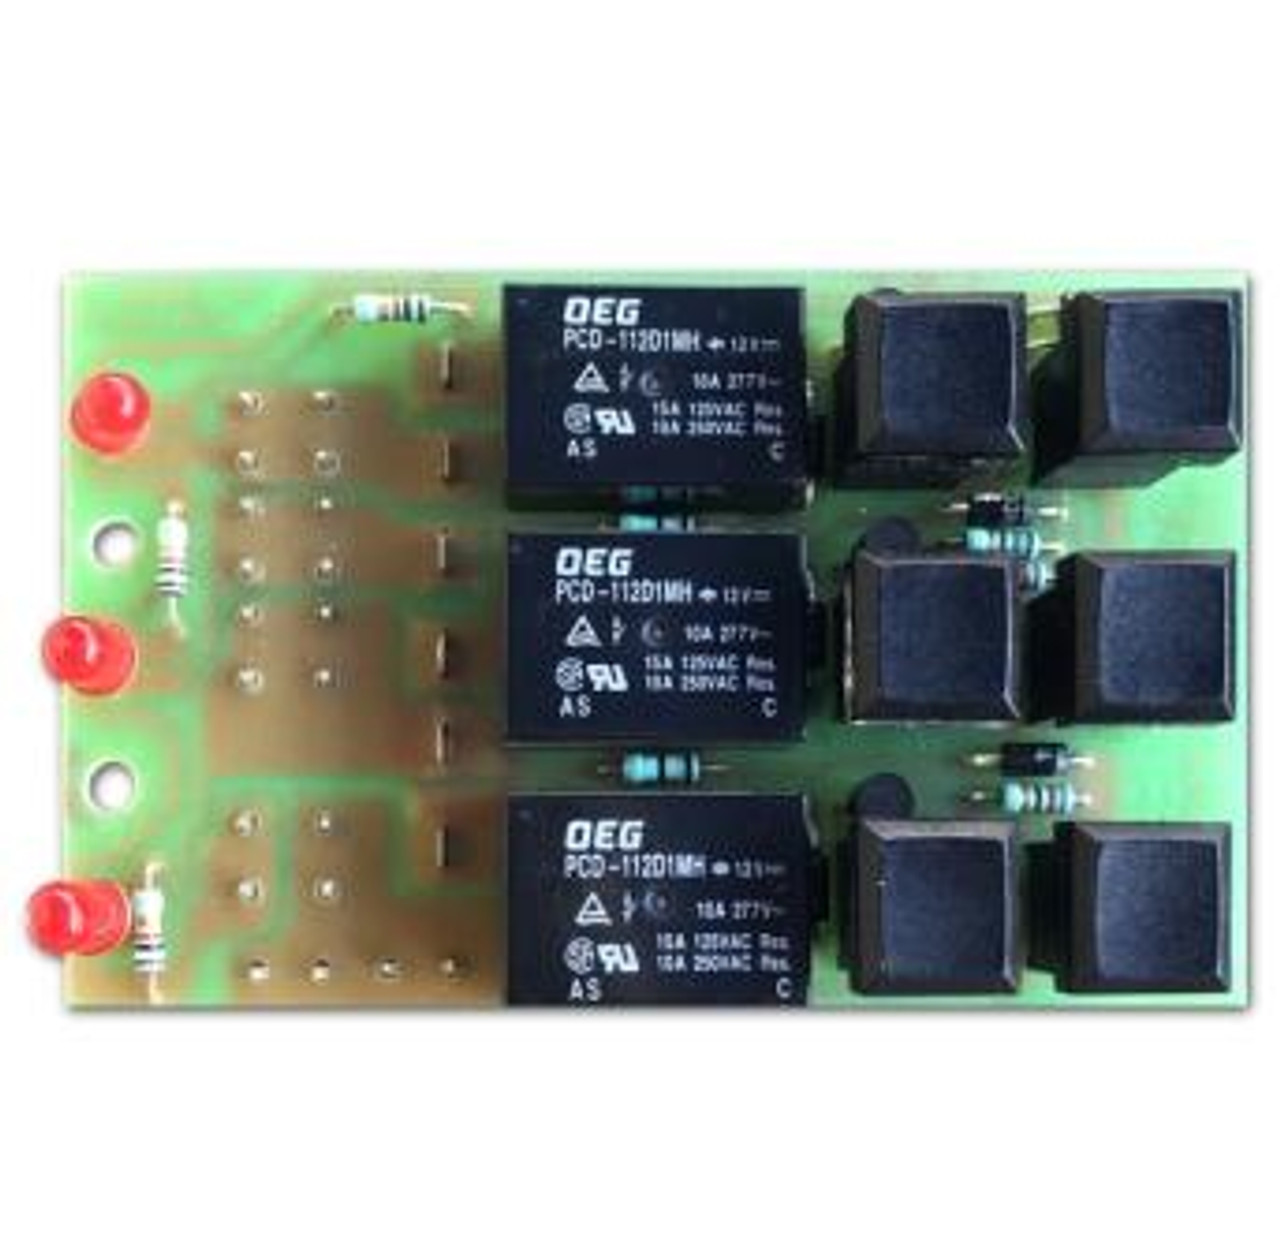 Relplaces original Scheiber Jeanneau Relay Switch Panel (as shown)